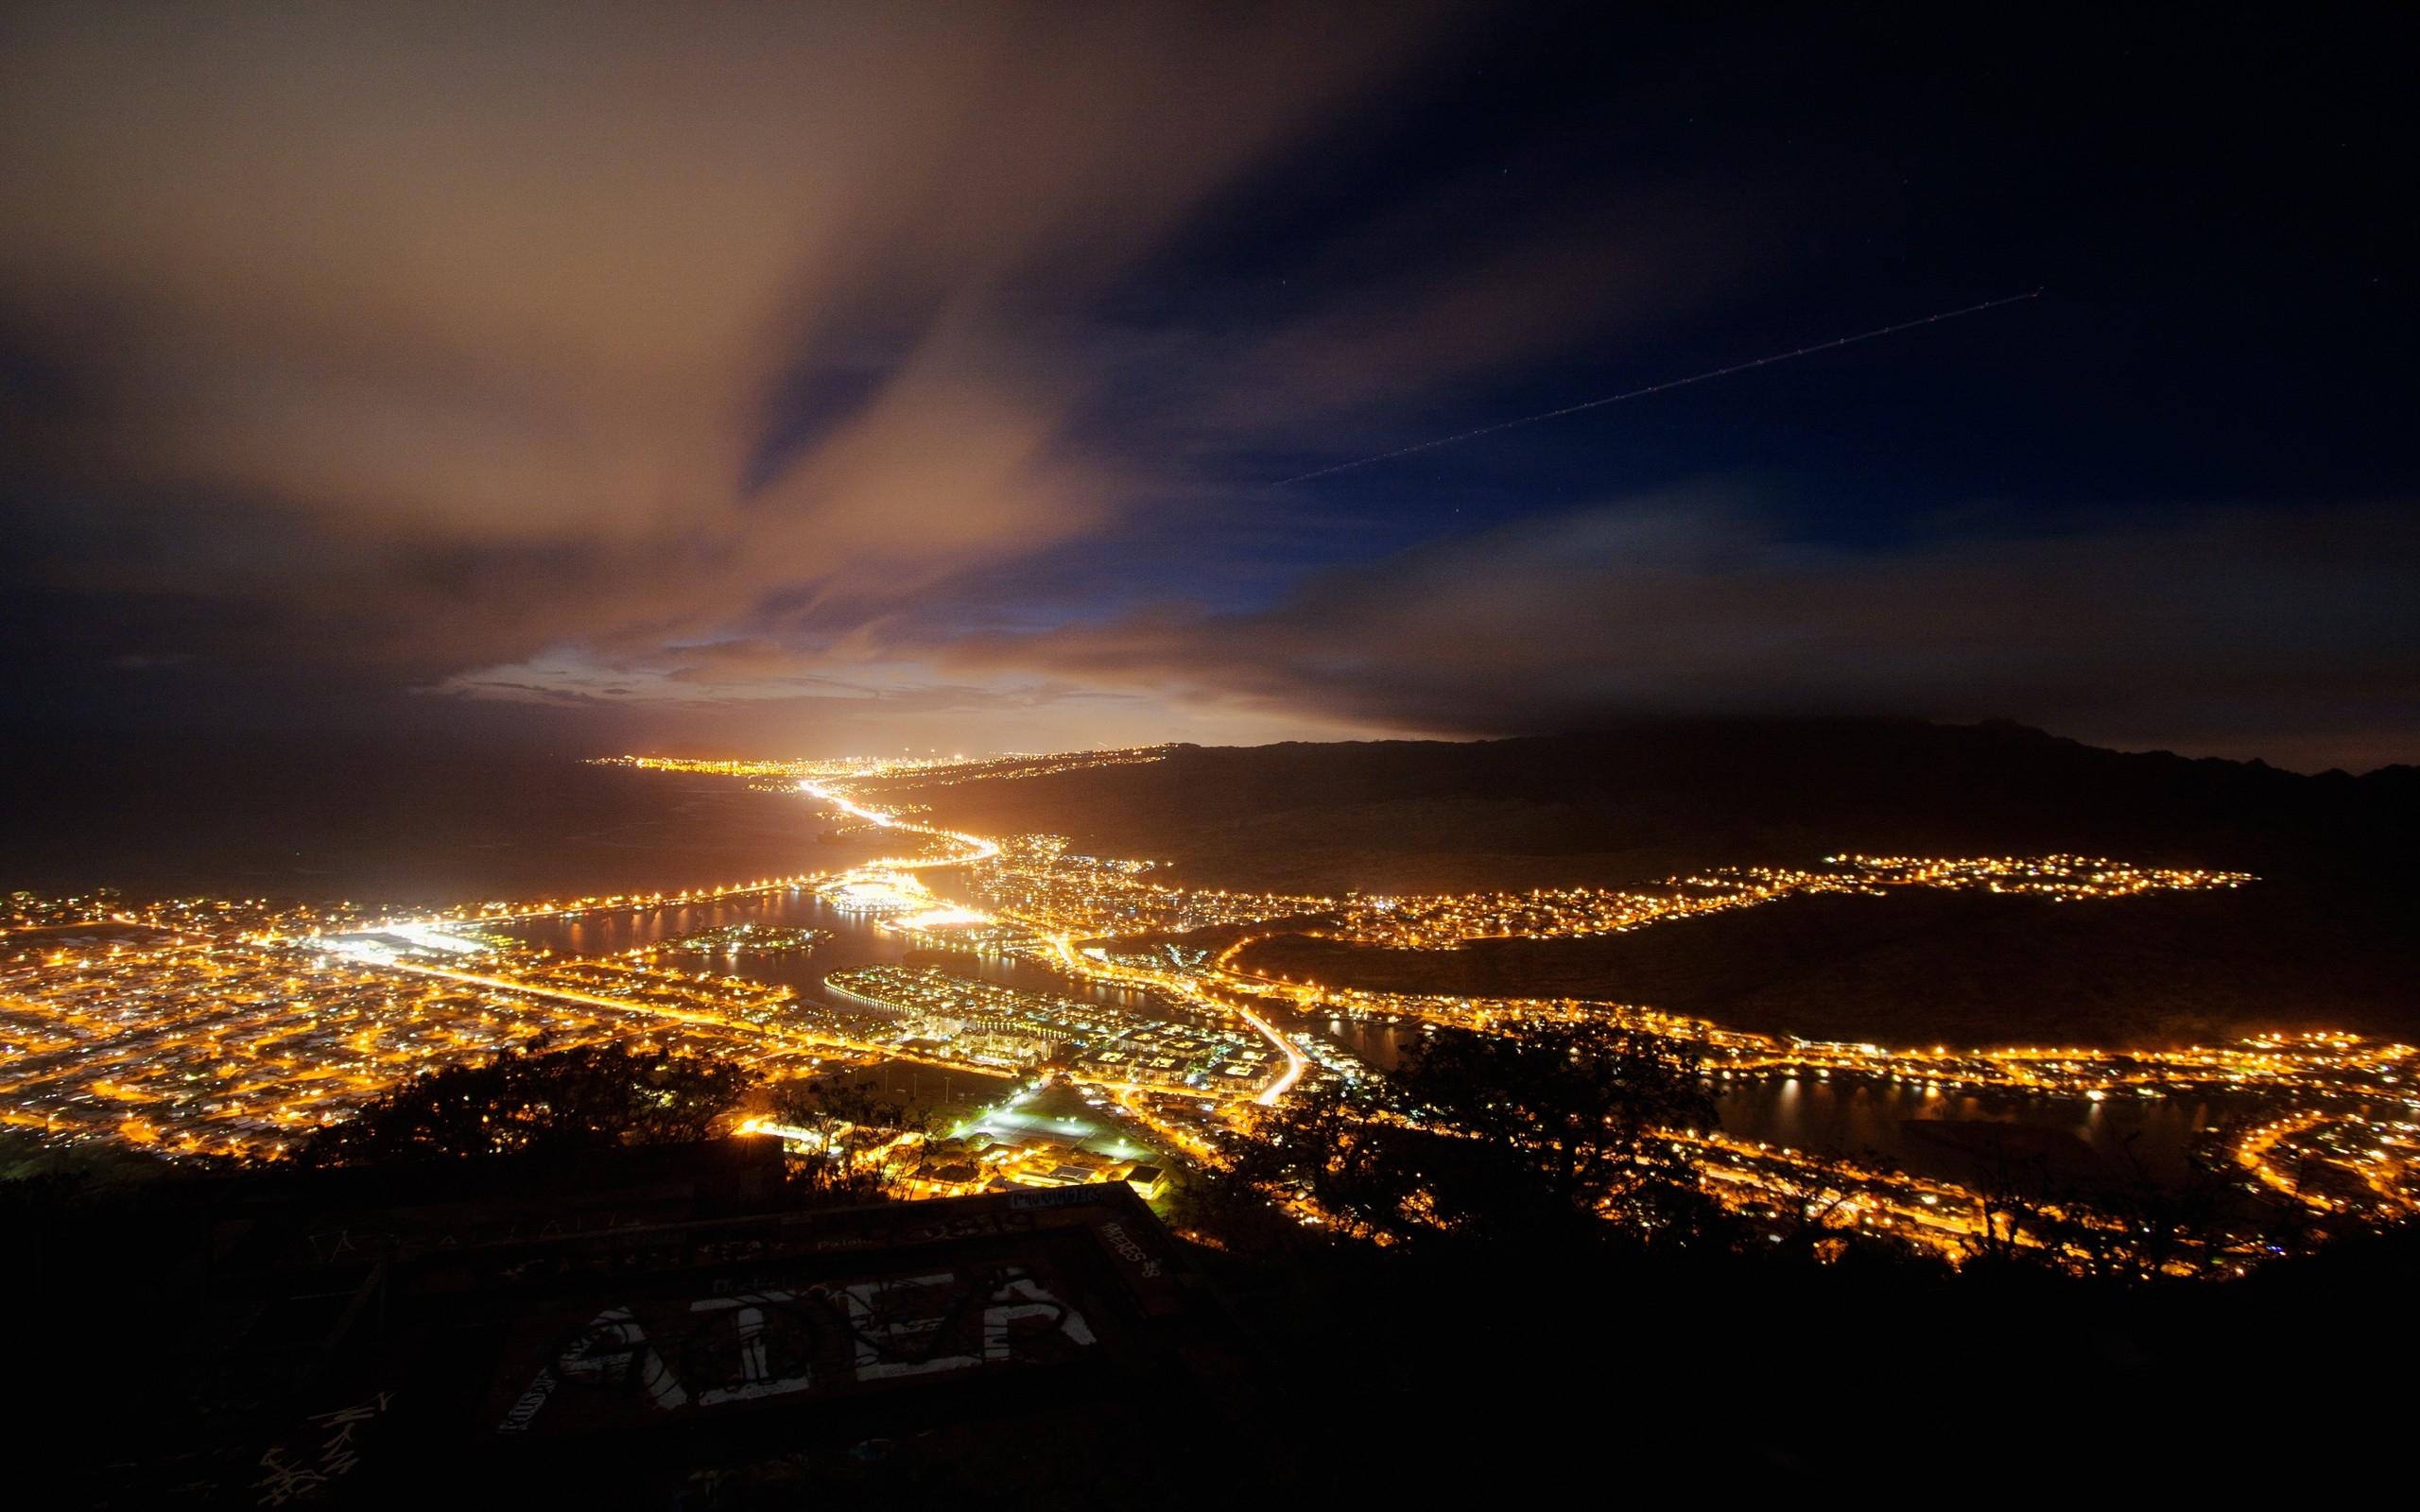 Wallpaper city night lights top view sky 2560x1600 coolwallpapers 678691 hd - Light night wallpaper ...